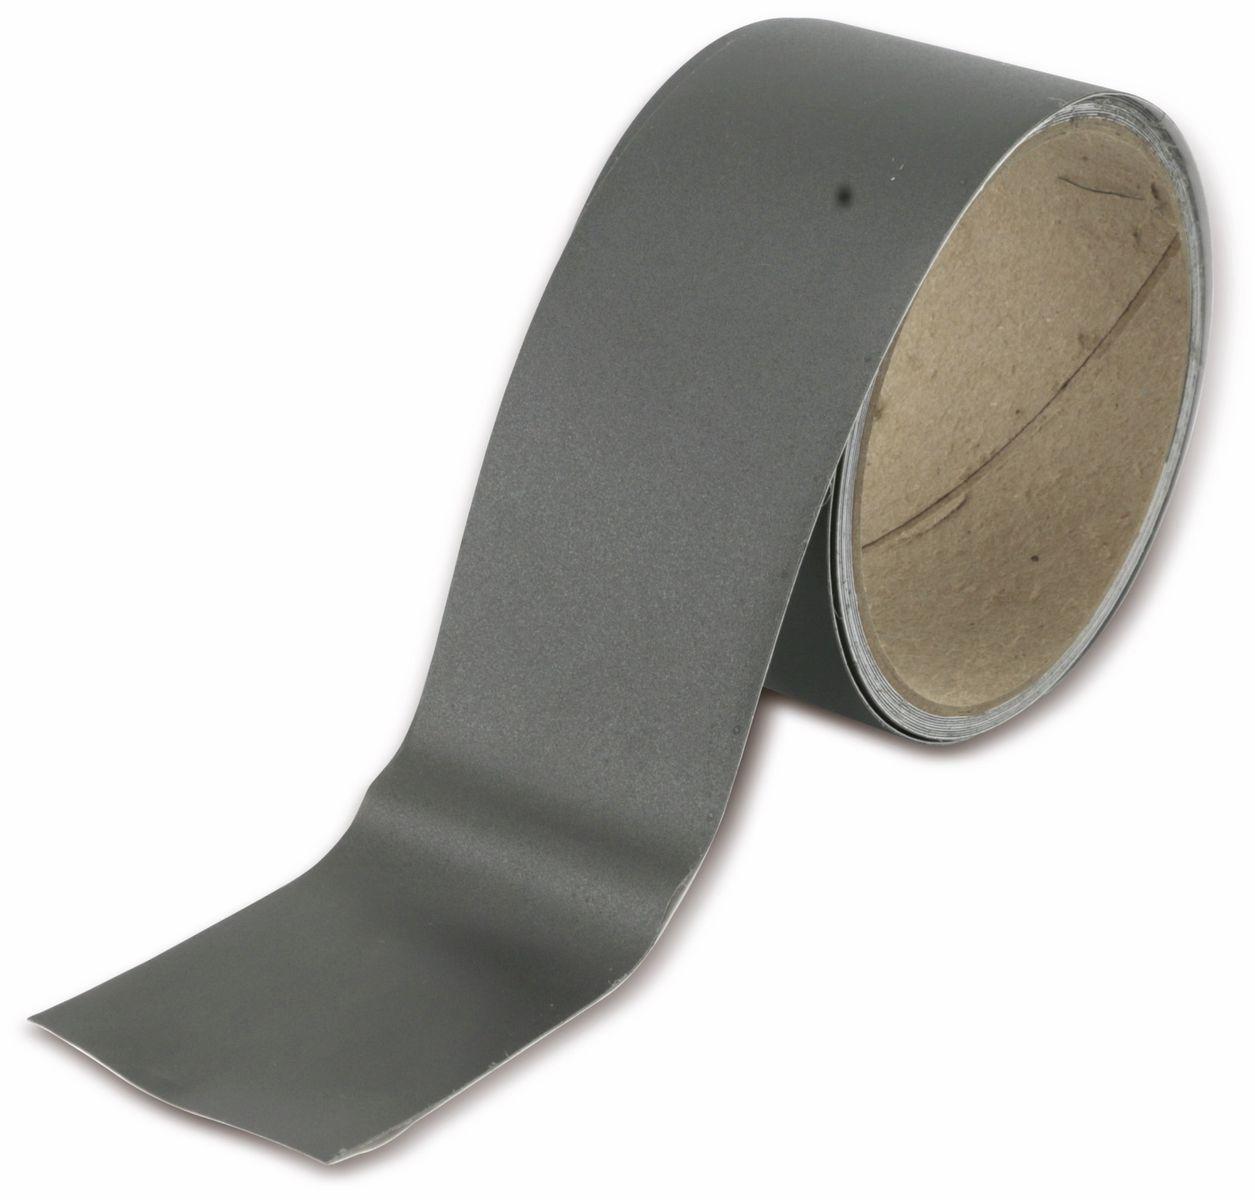 kreidetafel tape schwarz 3 6 m. Black Bedroom Furniture Sets. Home Design Ideas